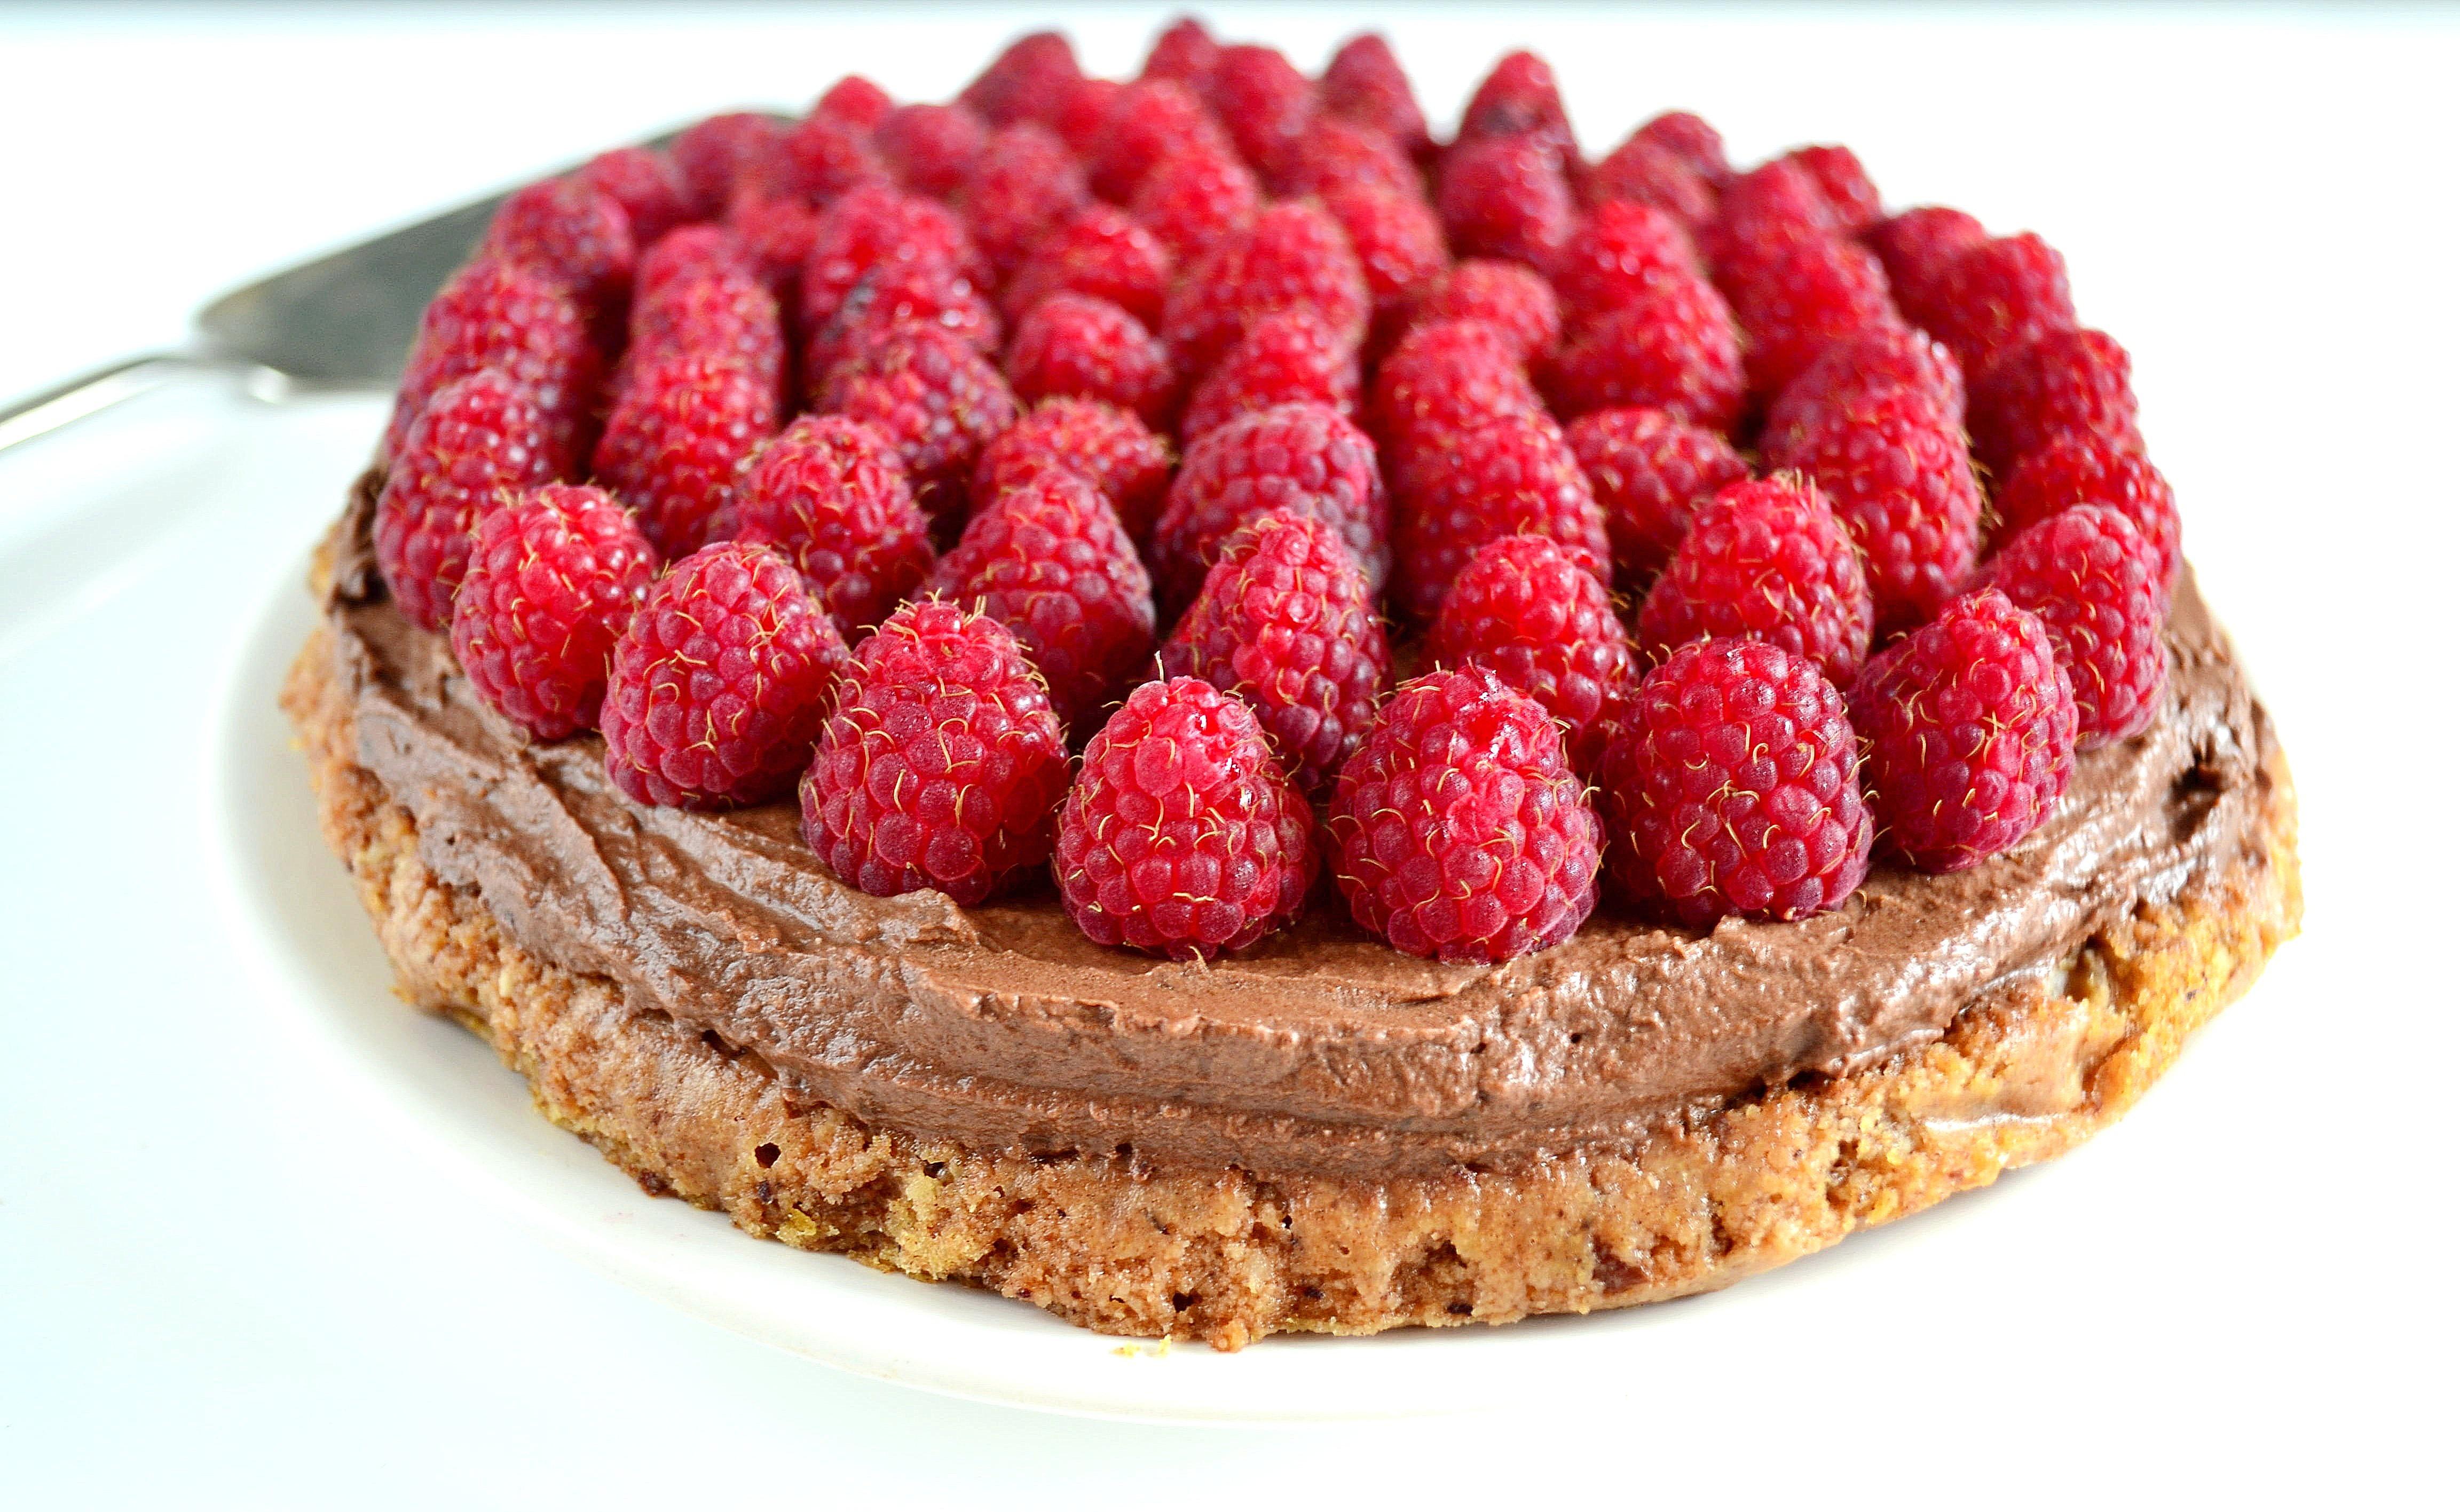 Wegańskie ciasto z malinami bez cukru